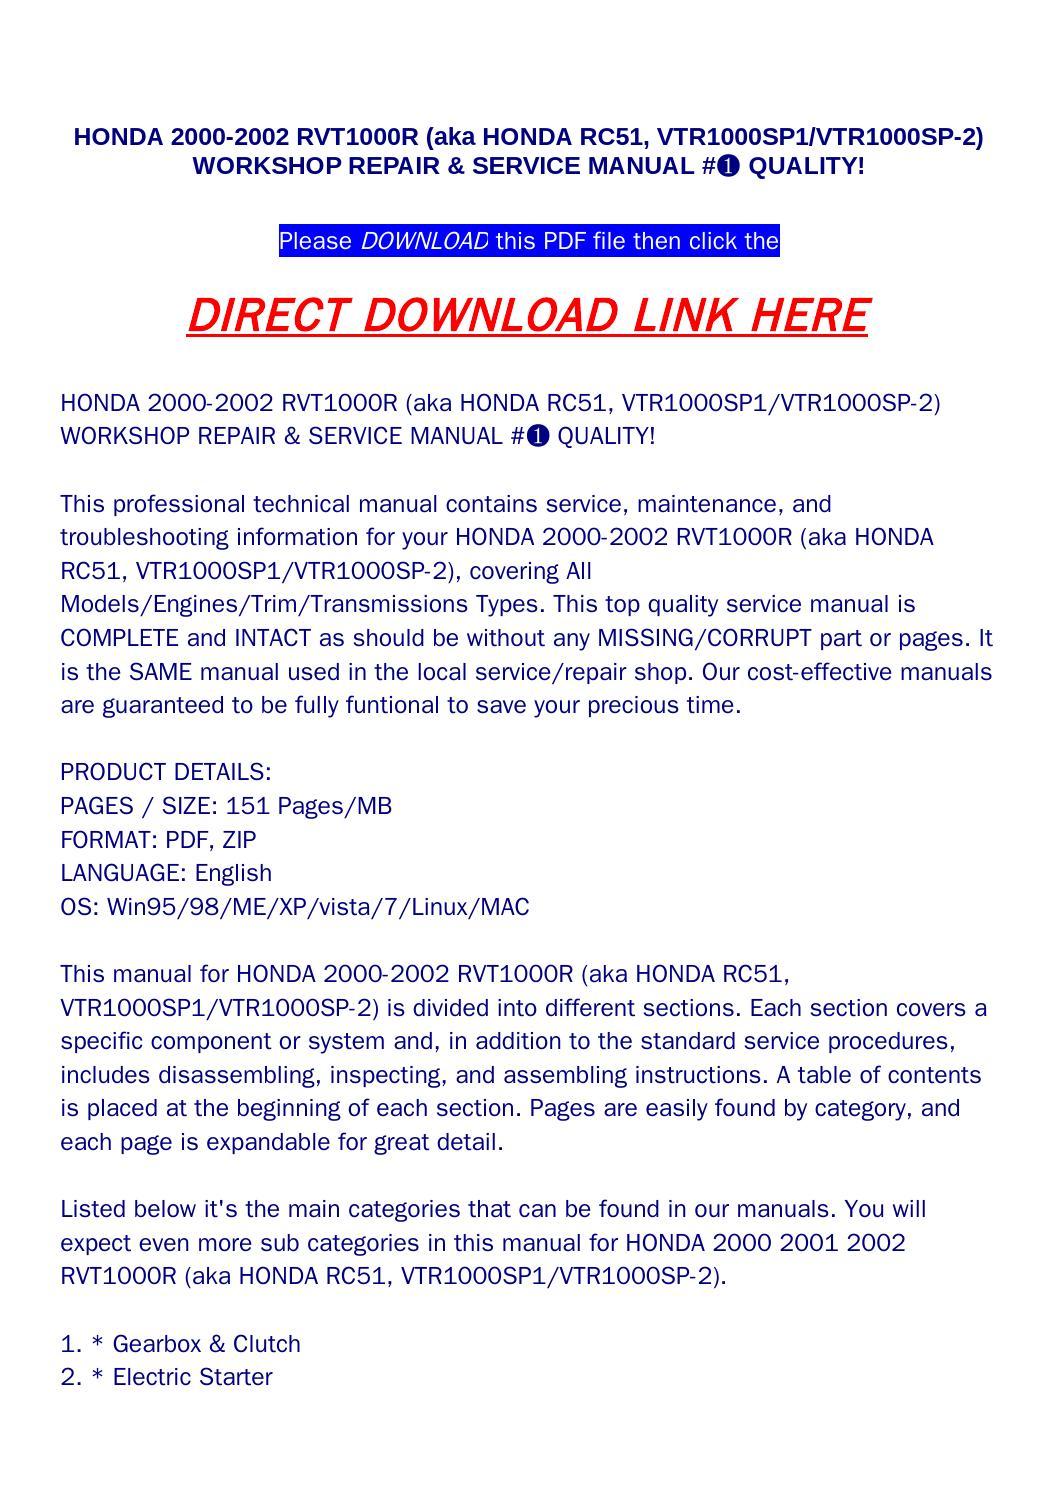 Honda Rc51 Wiring Diagram Cluster Reveolution Of Bali 2003 Goldwing Accessories Cbr 600 Harness